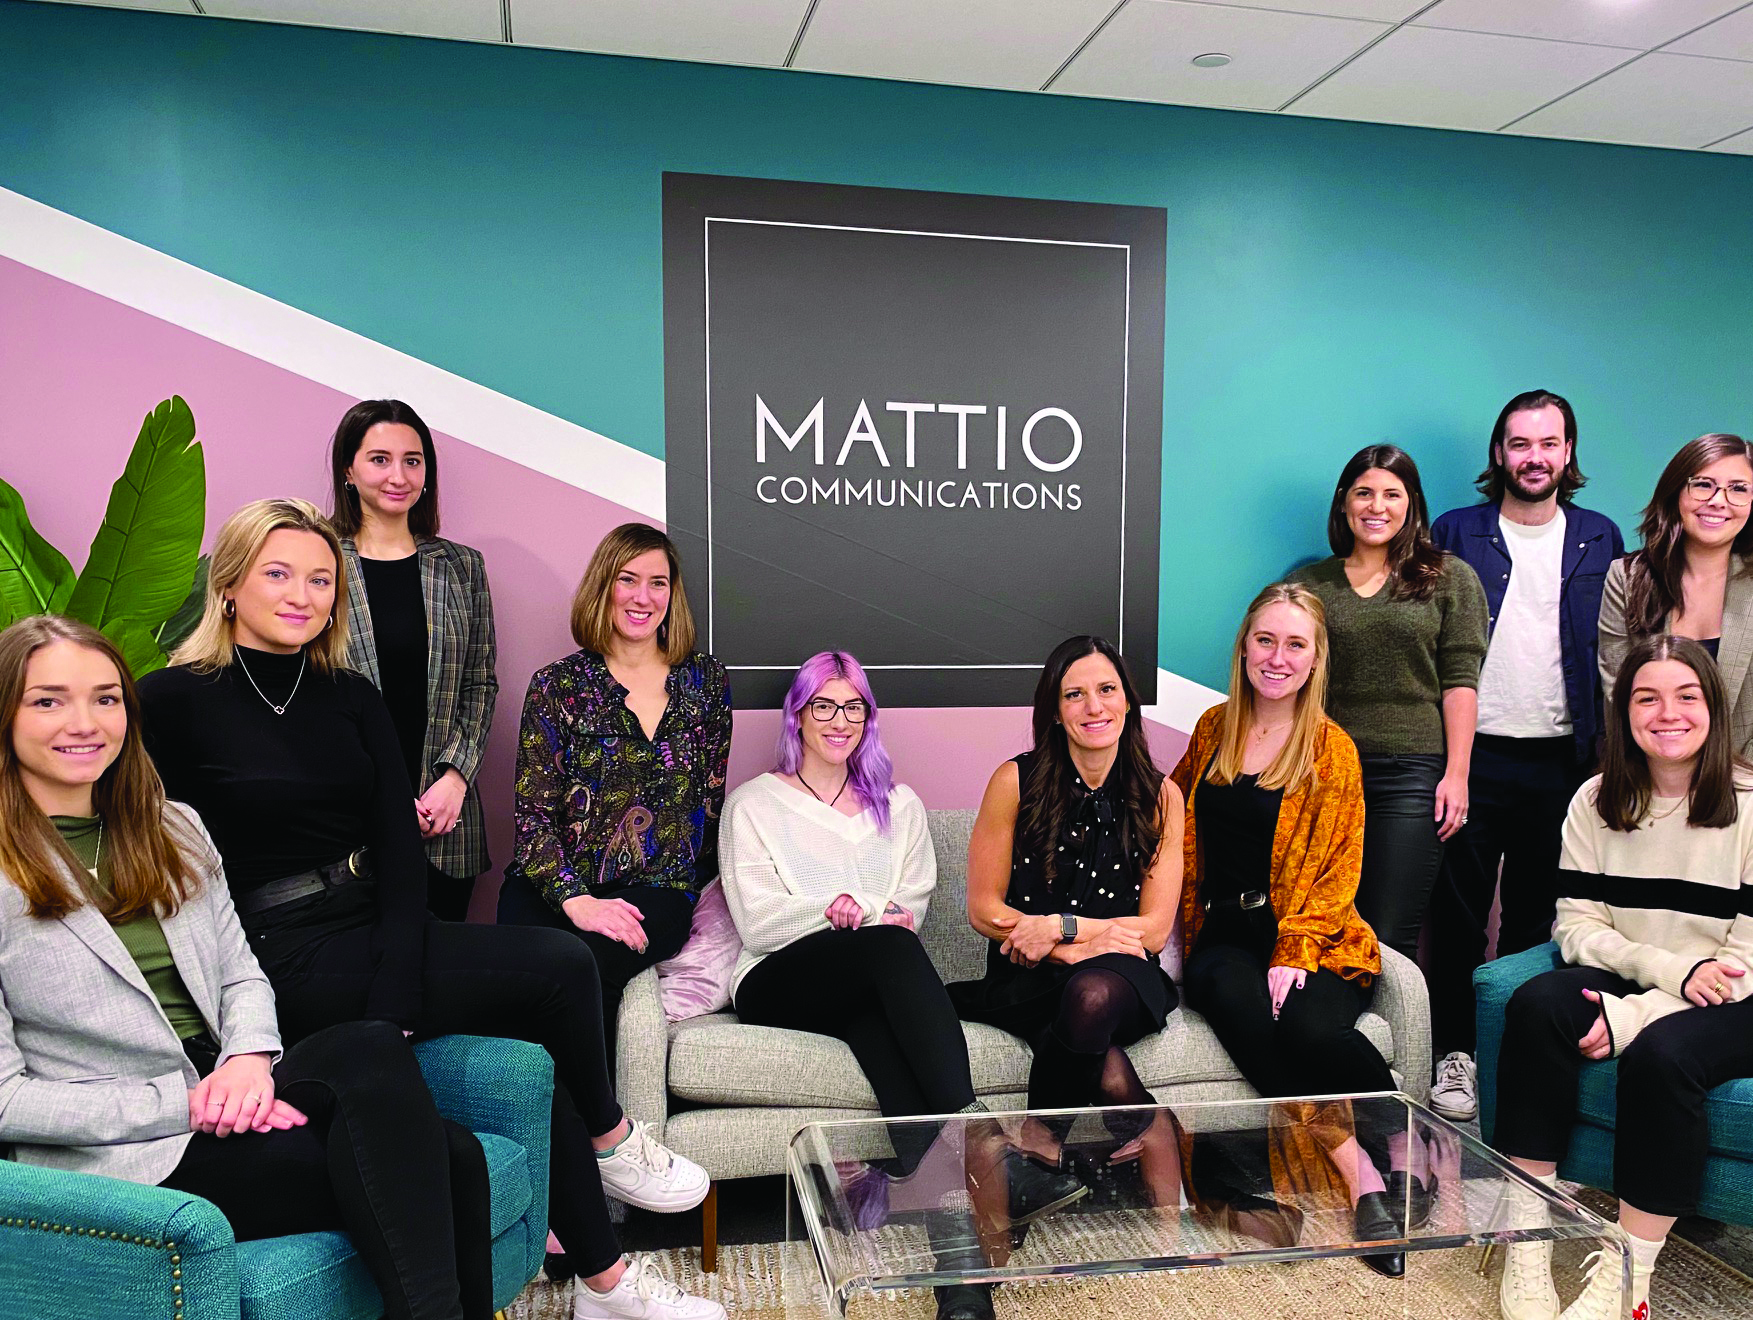 Mattio Communications team photo